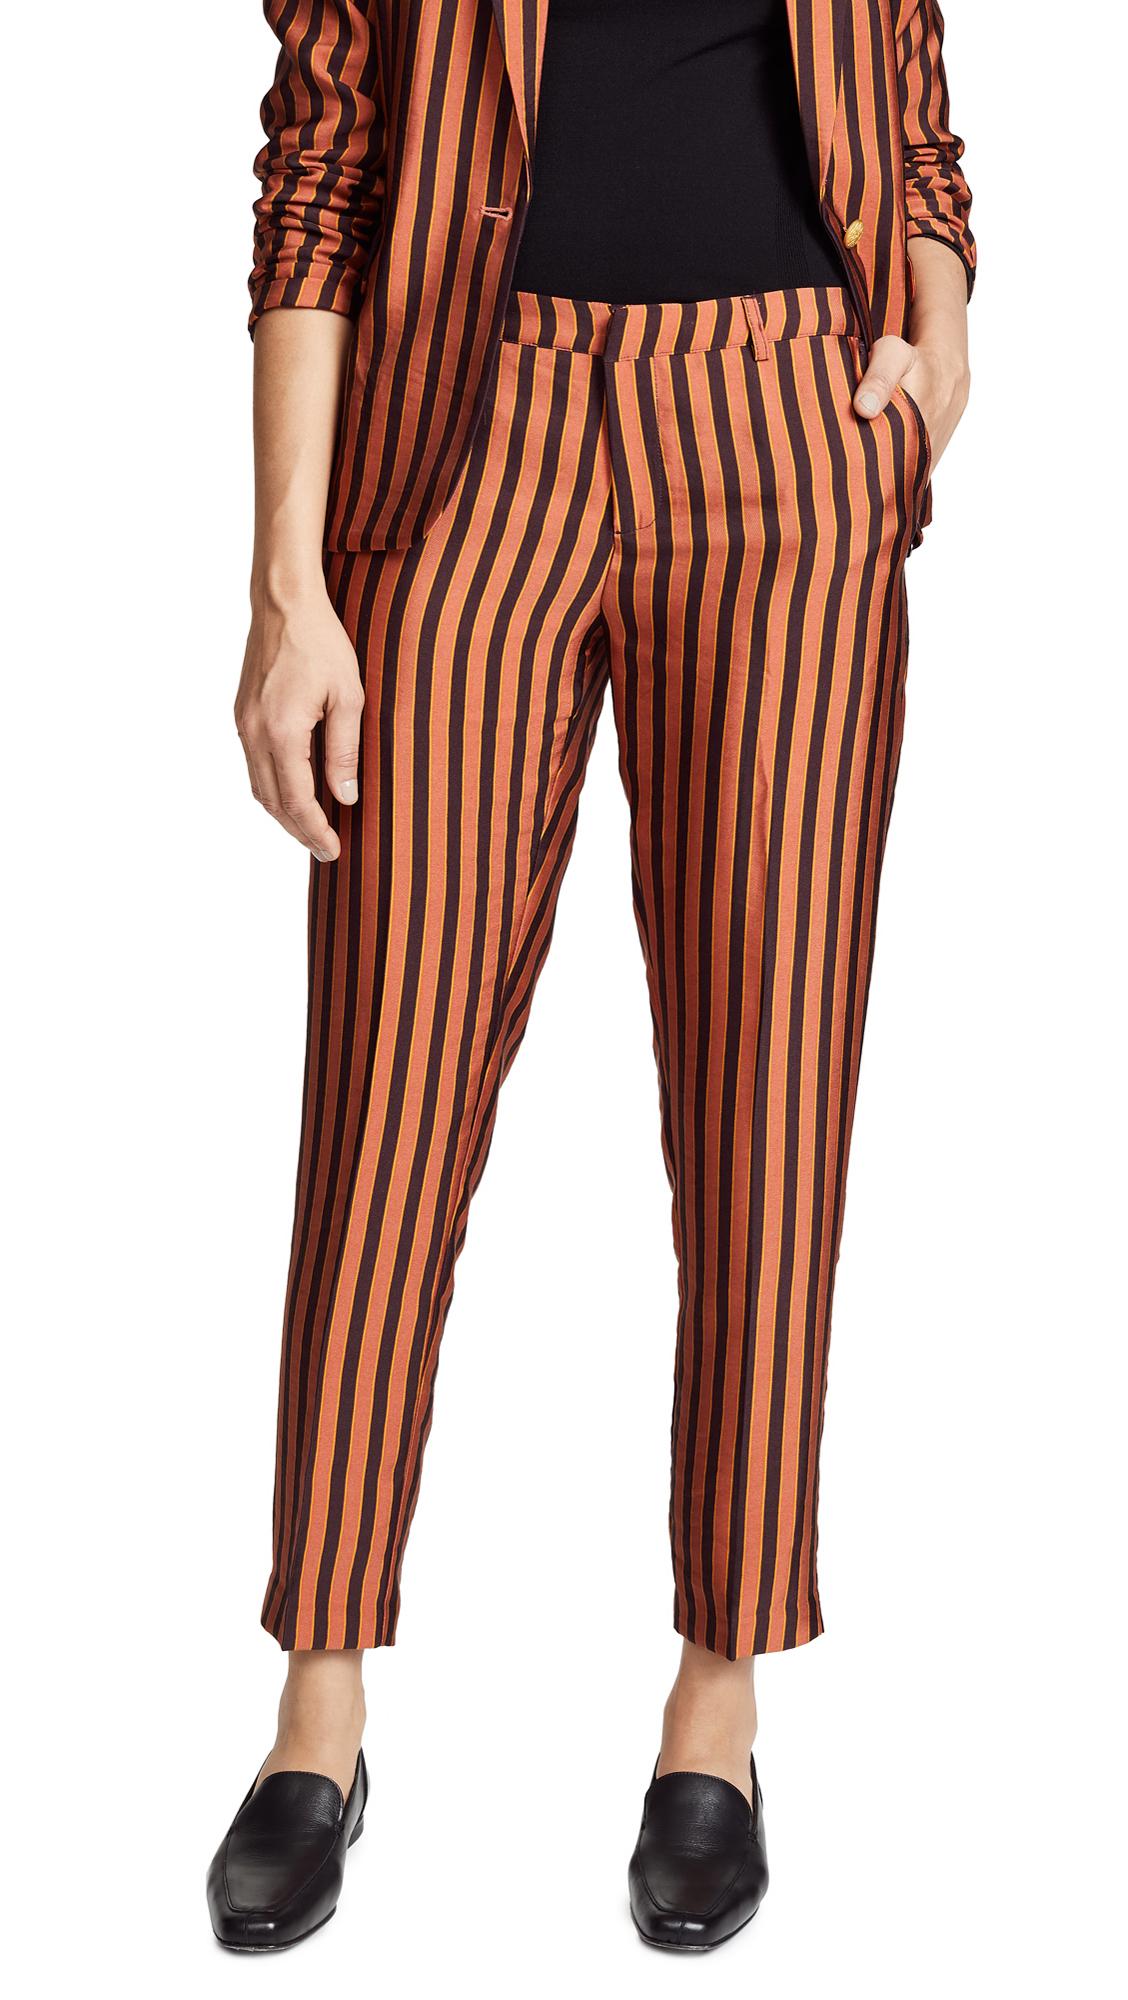 Scotch & Soda/Maison Scotch Striped Tailored Pants In Combo S